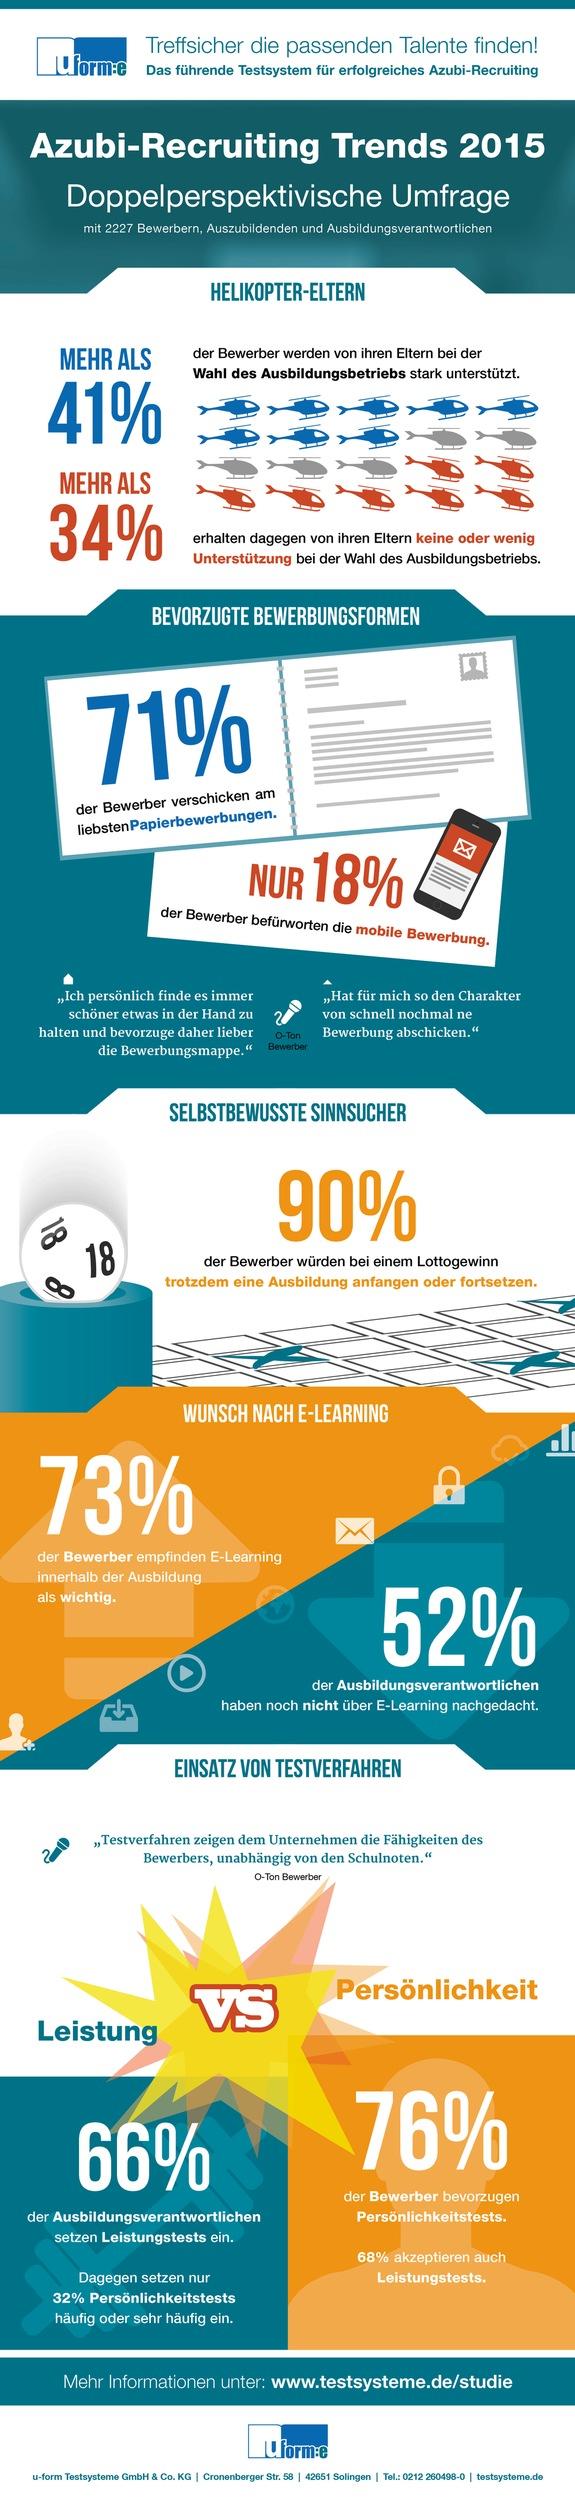 "Azubi-Bewerber: überbehütet oder allein gelassen? / Studie ""Azubi-Recruiting Trends 2015"" korrigiert Klischees"